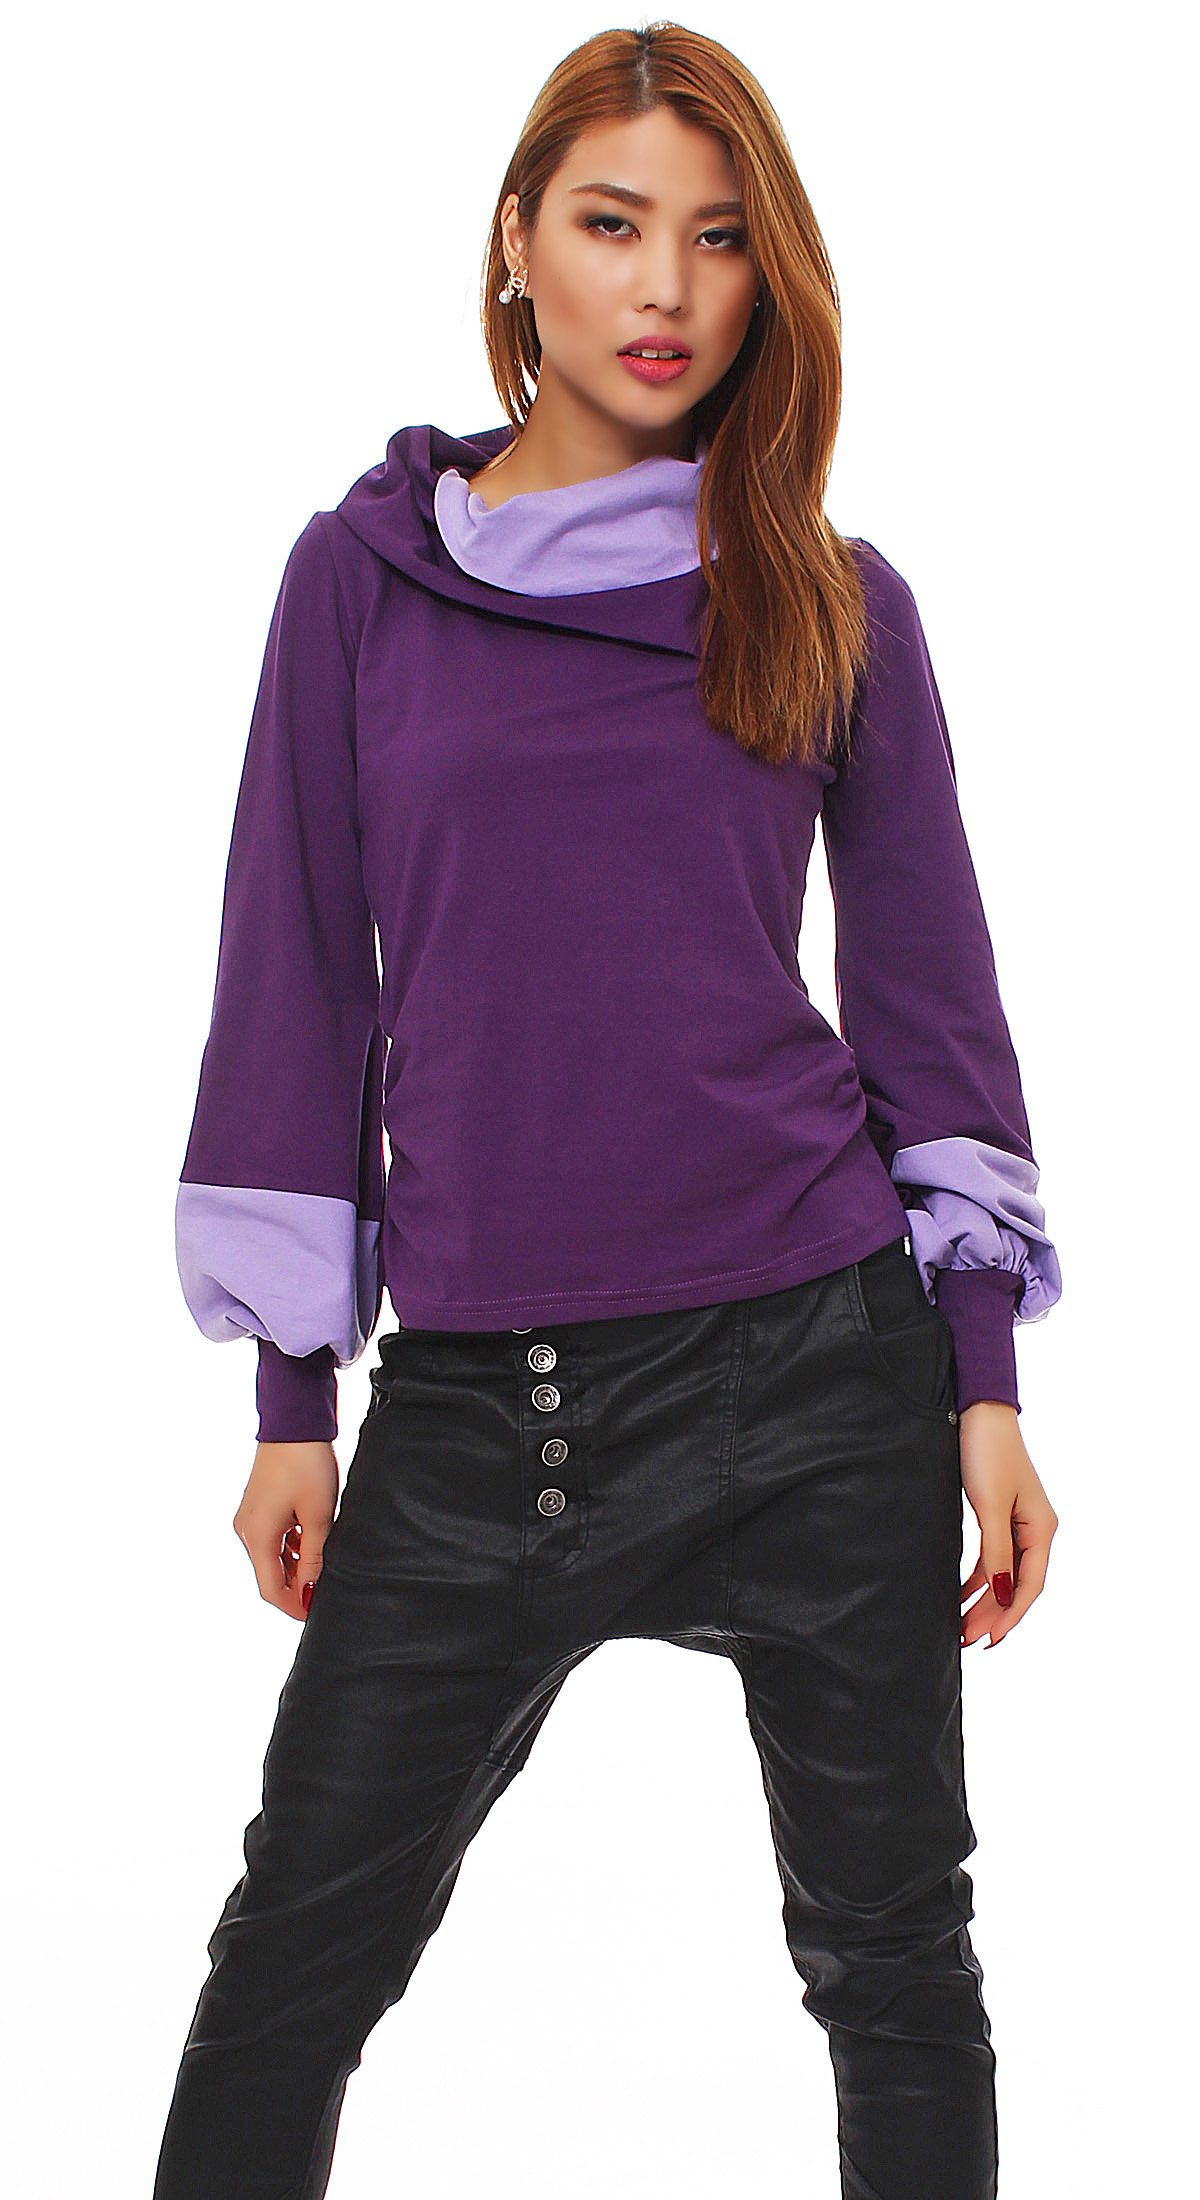 damen longshirt pullover bluse shirt tunika pulli langarm. Black Bedroom Furniture Sets. Home Design Ideas